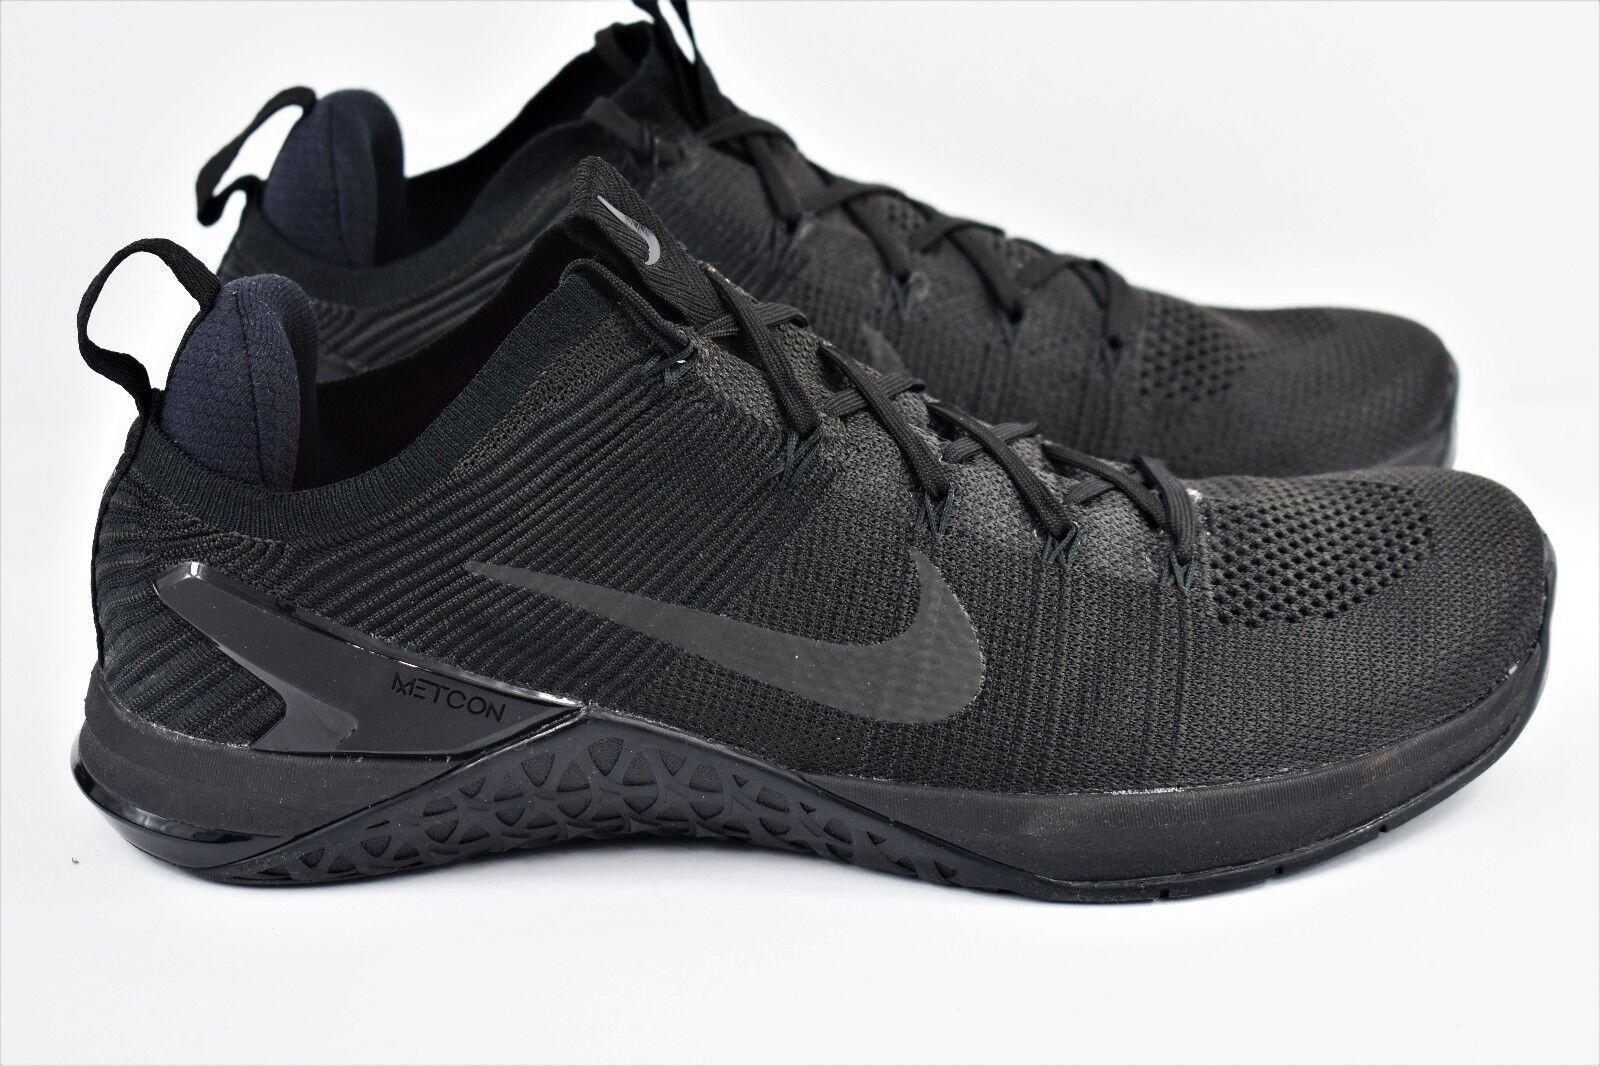 Nike Metcon DSX Flyknit Mens Size 11.5 Training 004 Shoes Triple Black 924423 004 Training 91ecf4